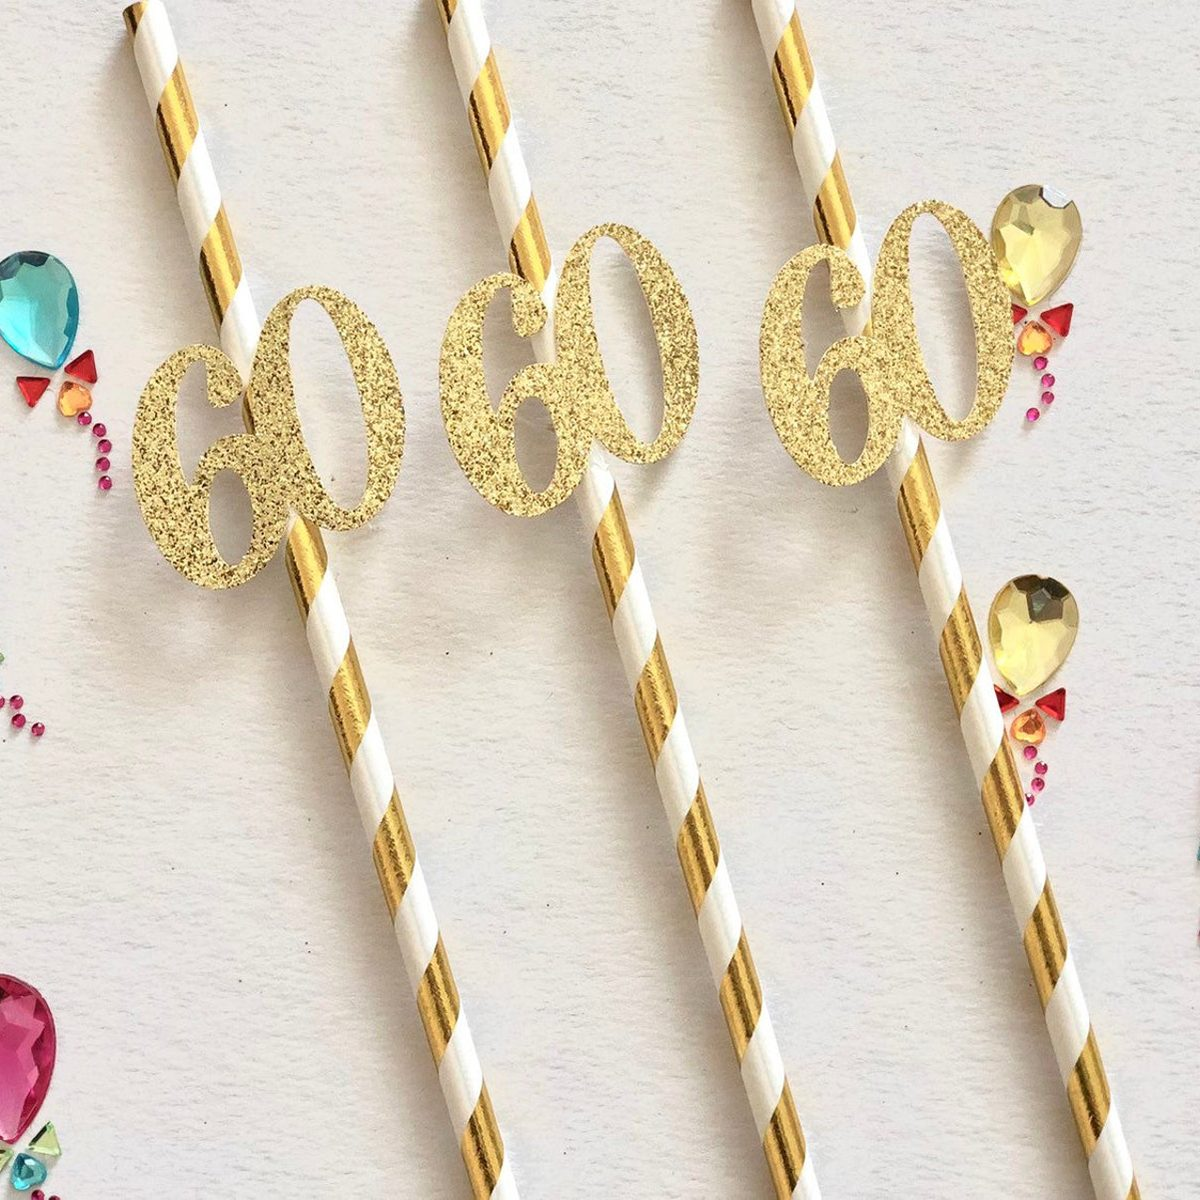 60th Birthday Straws, 60th Party Decorations, 60th Birthday Party Straws, Paper Straws